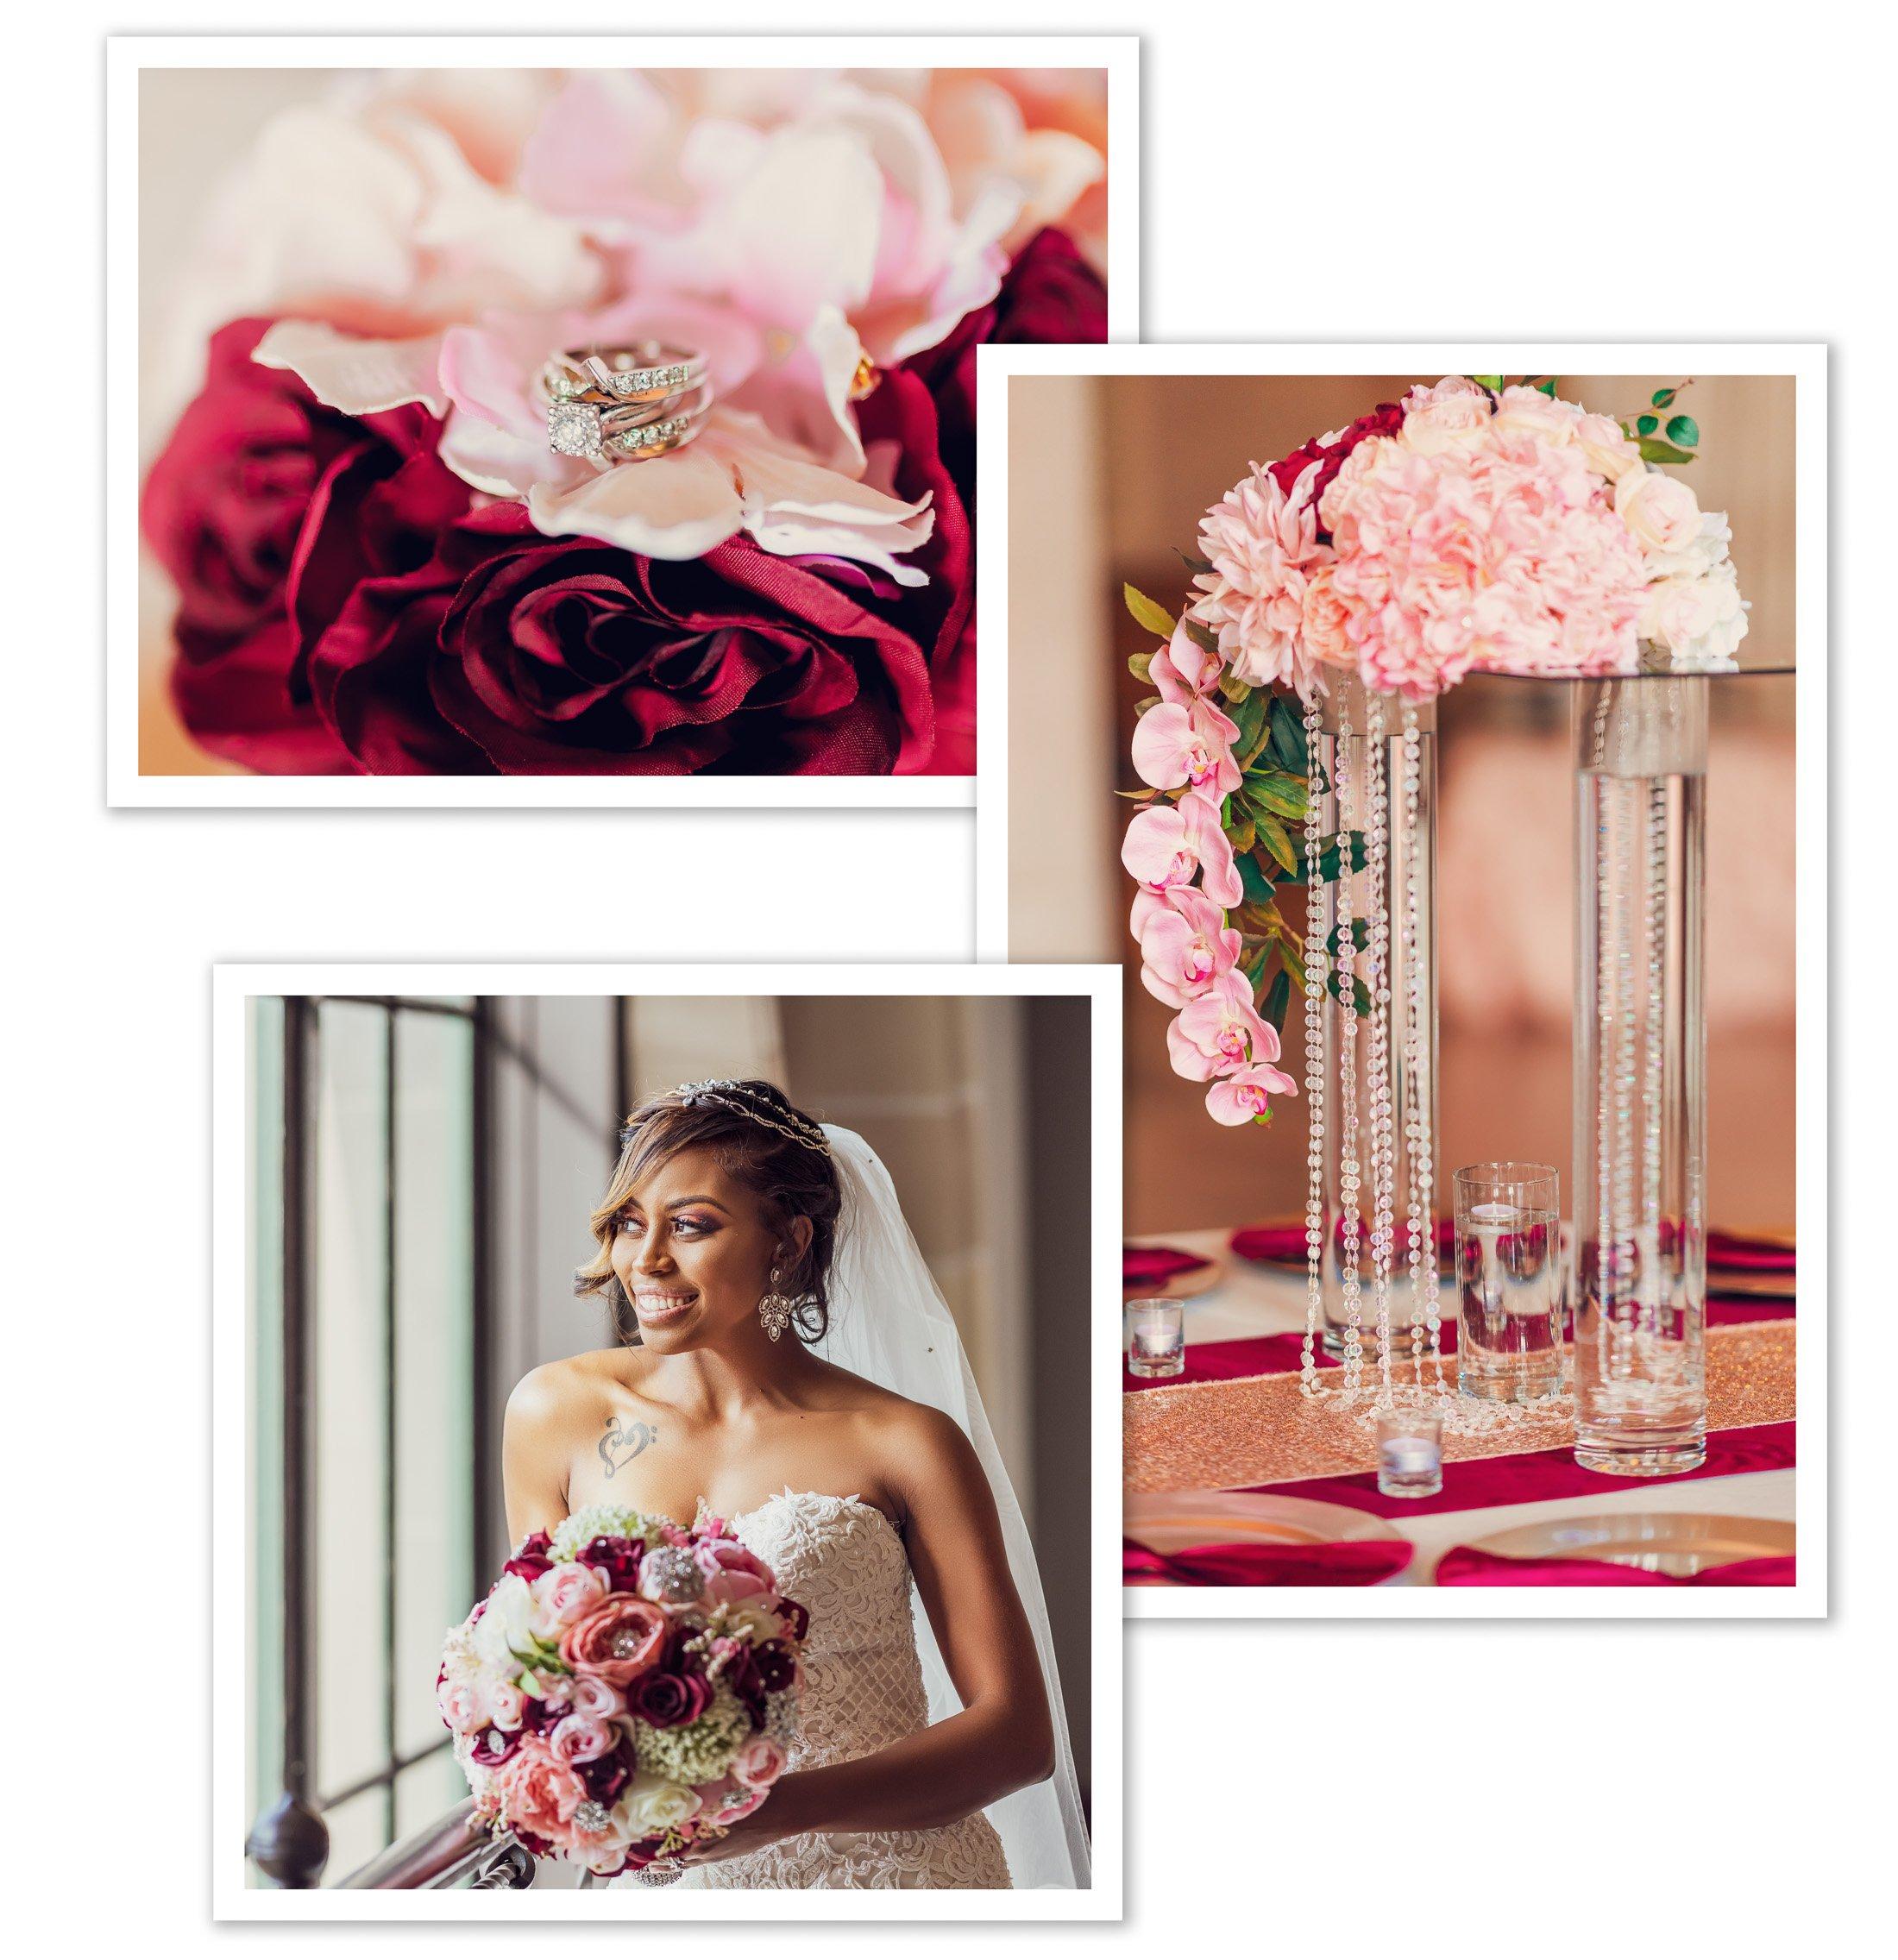 Wedding Photography Collage